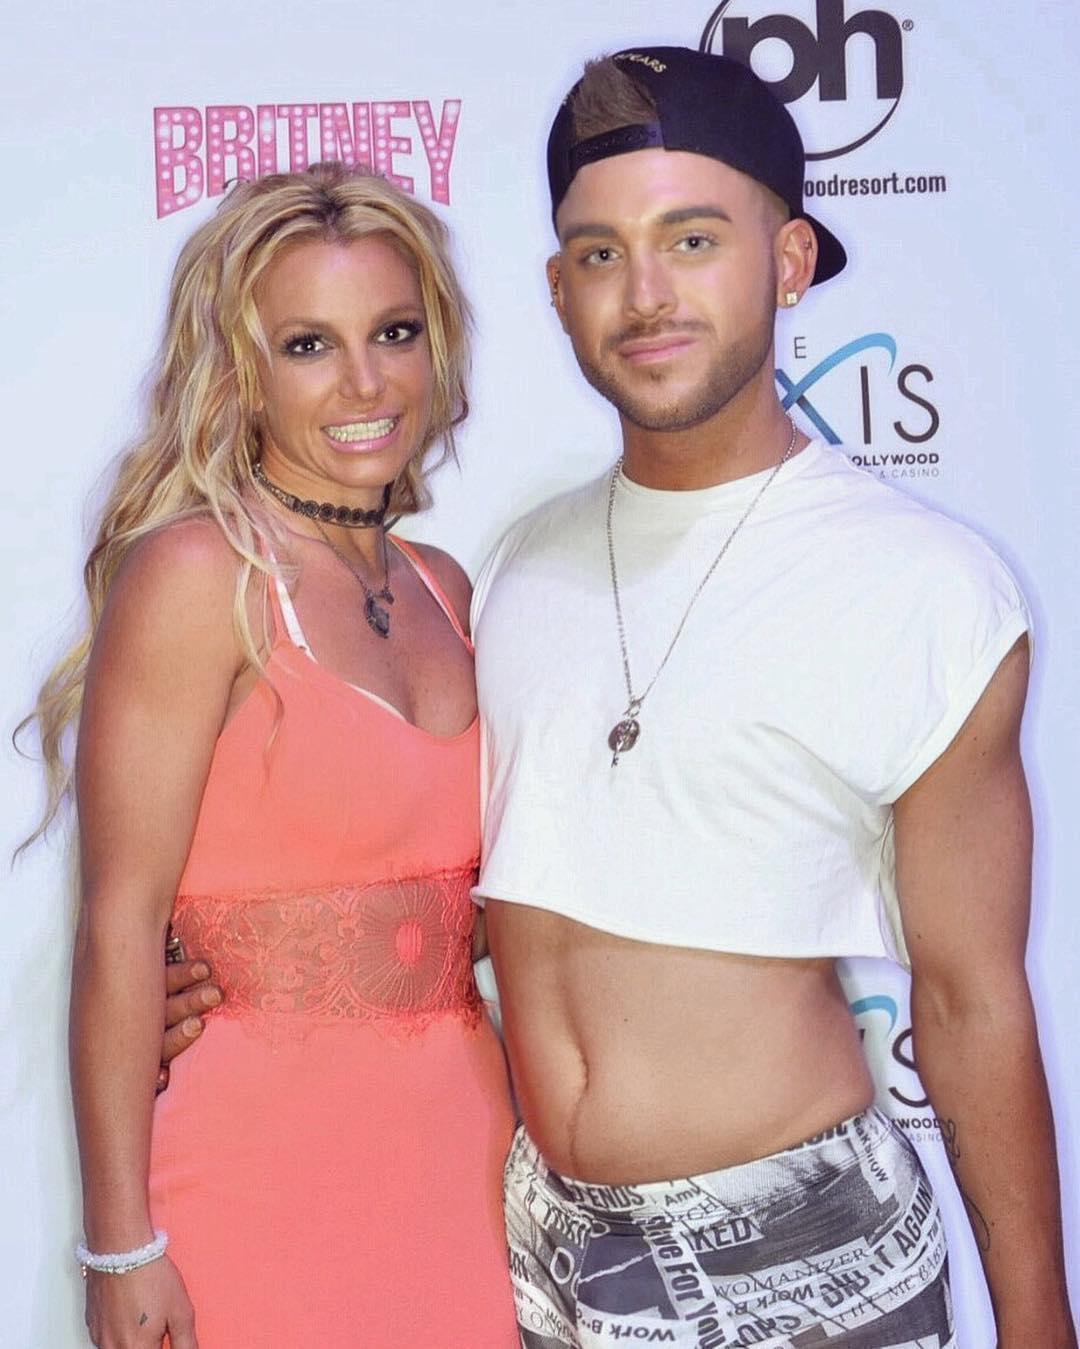 Britney spears meet and greet vegas gallery greetings card design britney spears piece of me las vegas residency meet and greet m4hsunfo